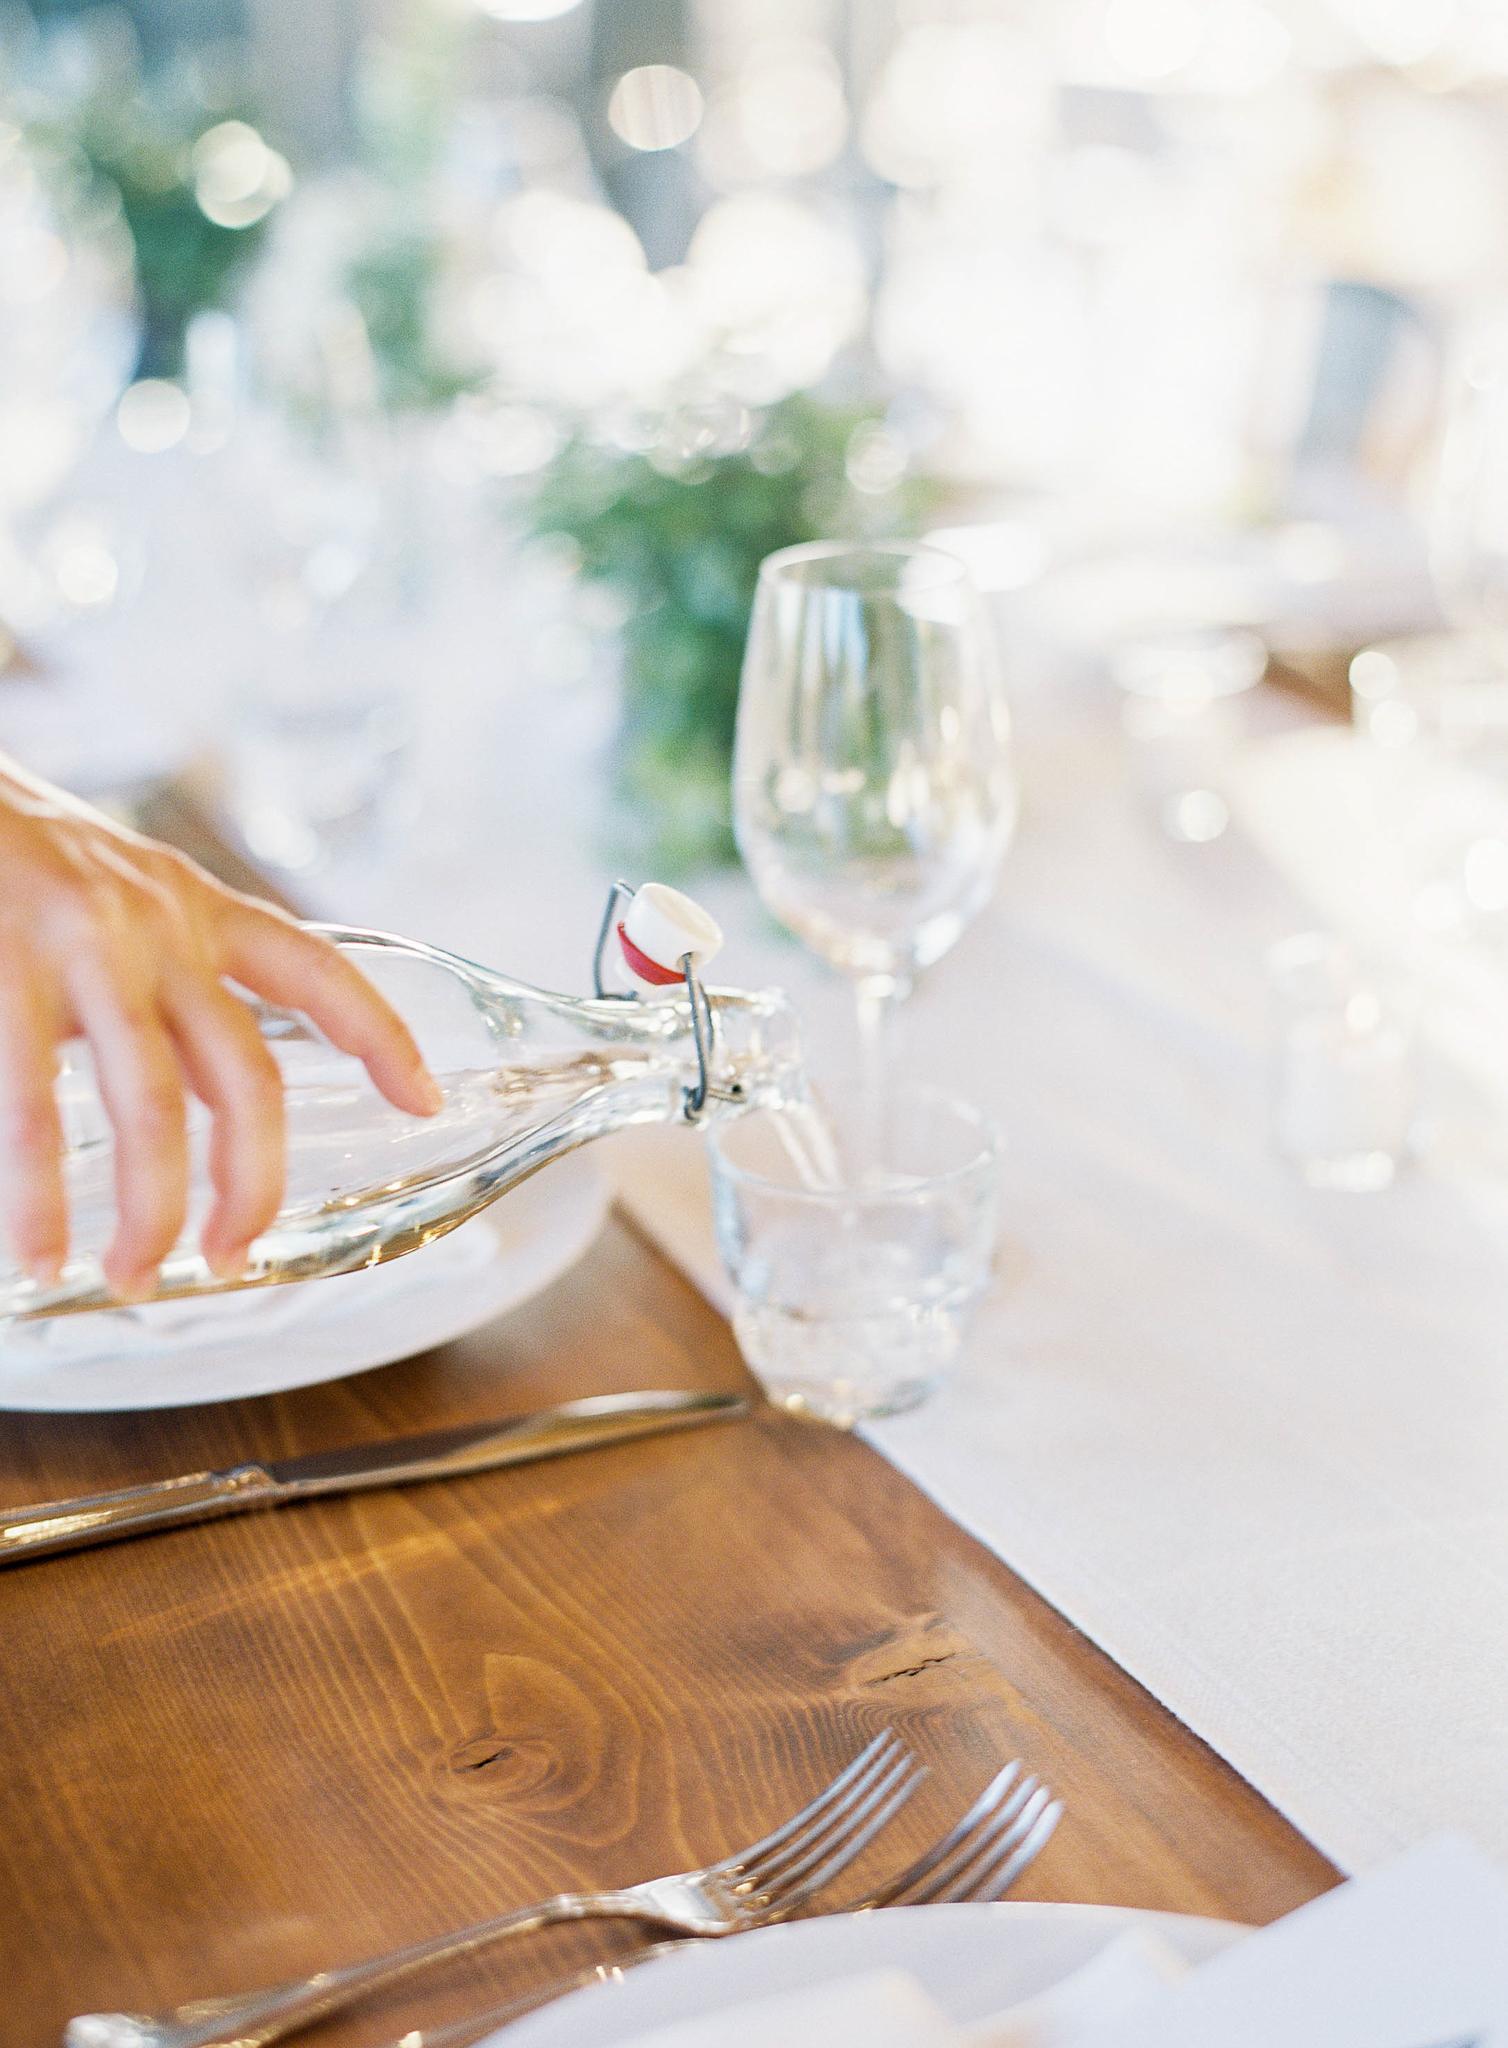 Meghan Mehan Photography - Fine Art Film Wedding Photography - San Francisco   Napa   Sonoma   Big Sur   Chicago   Minneapolis   Milwaukee   Lake Geneva   Door County   Wisconsin 067.jpg